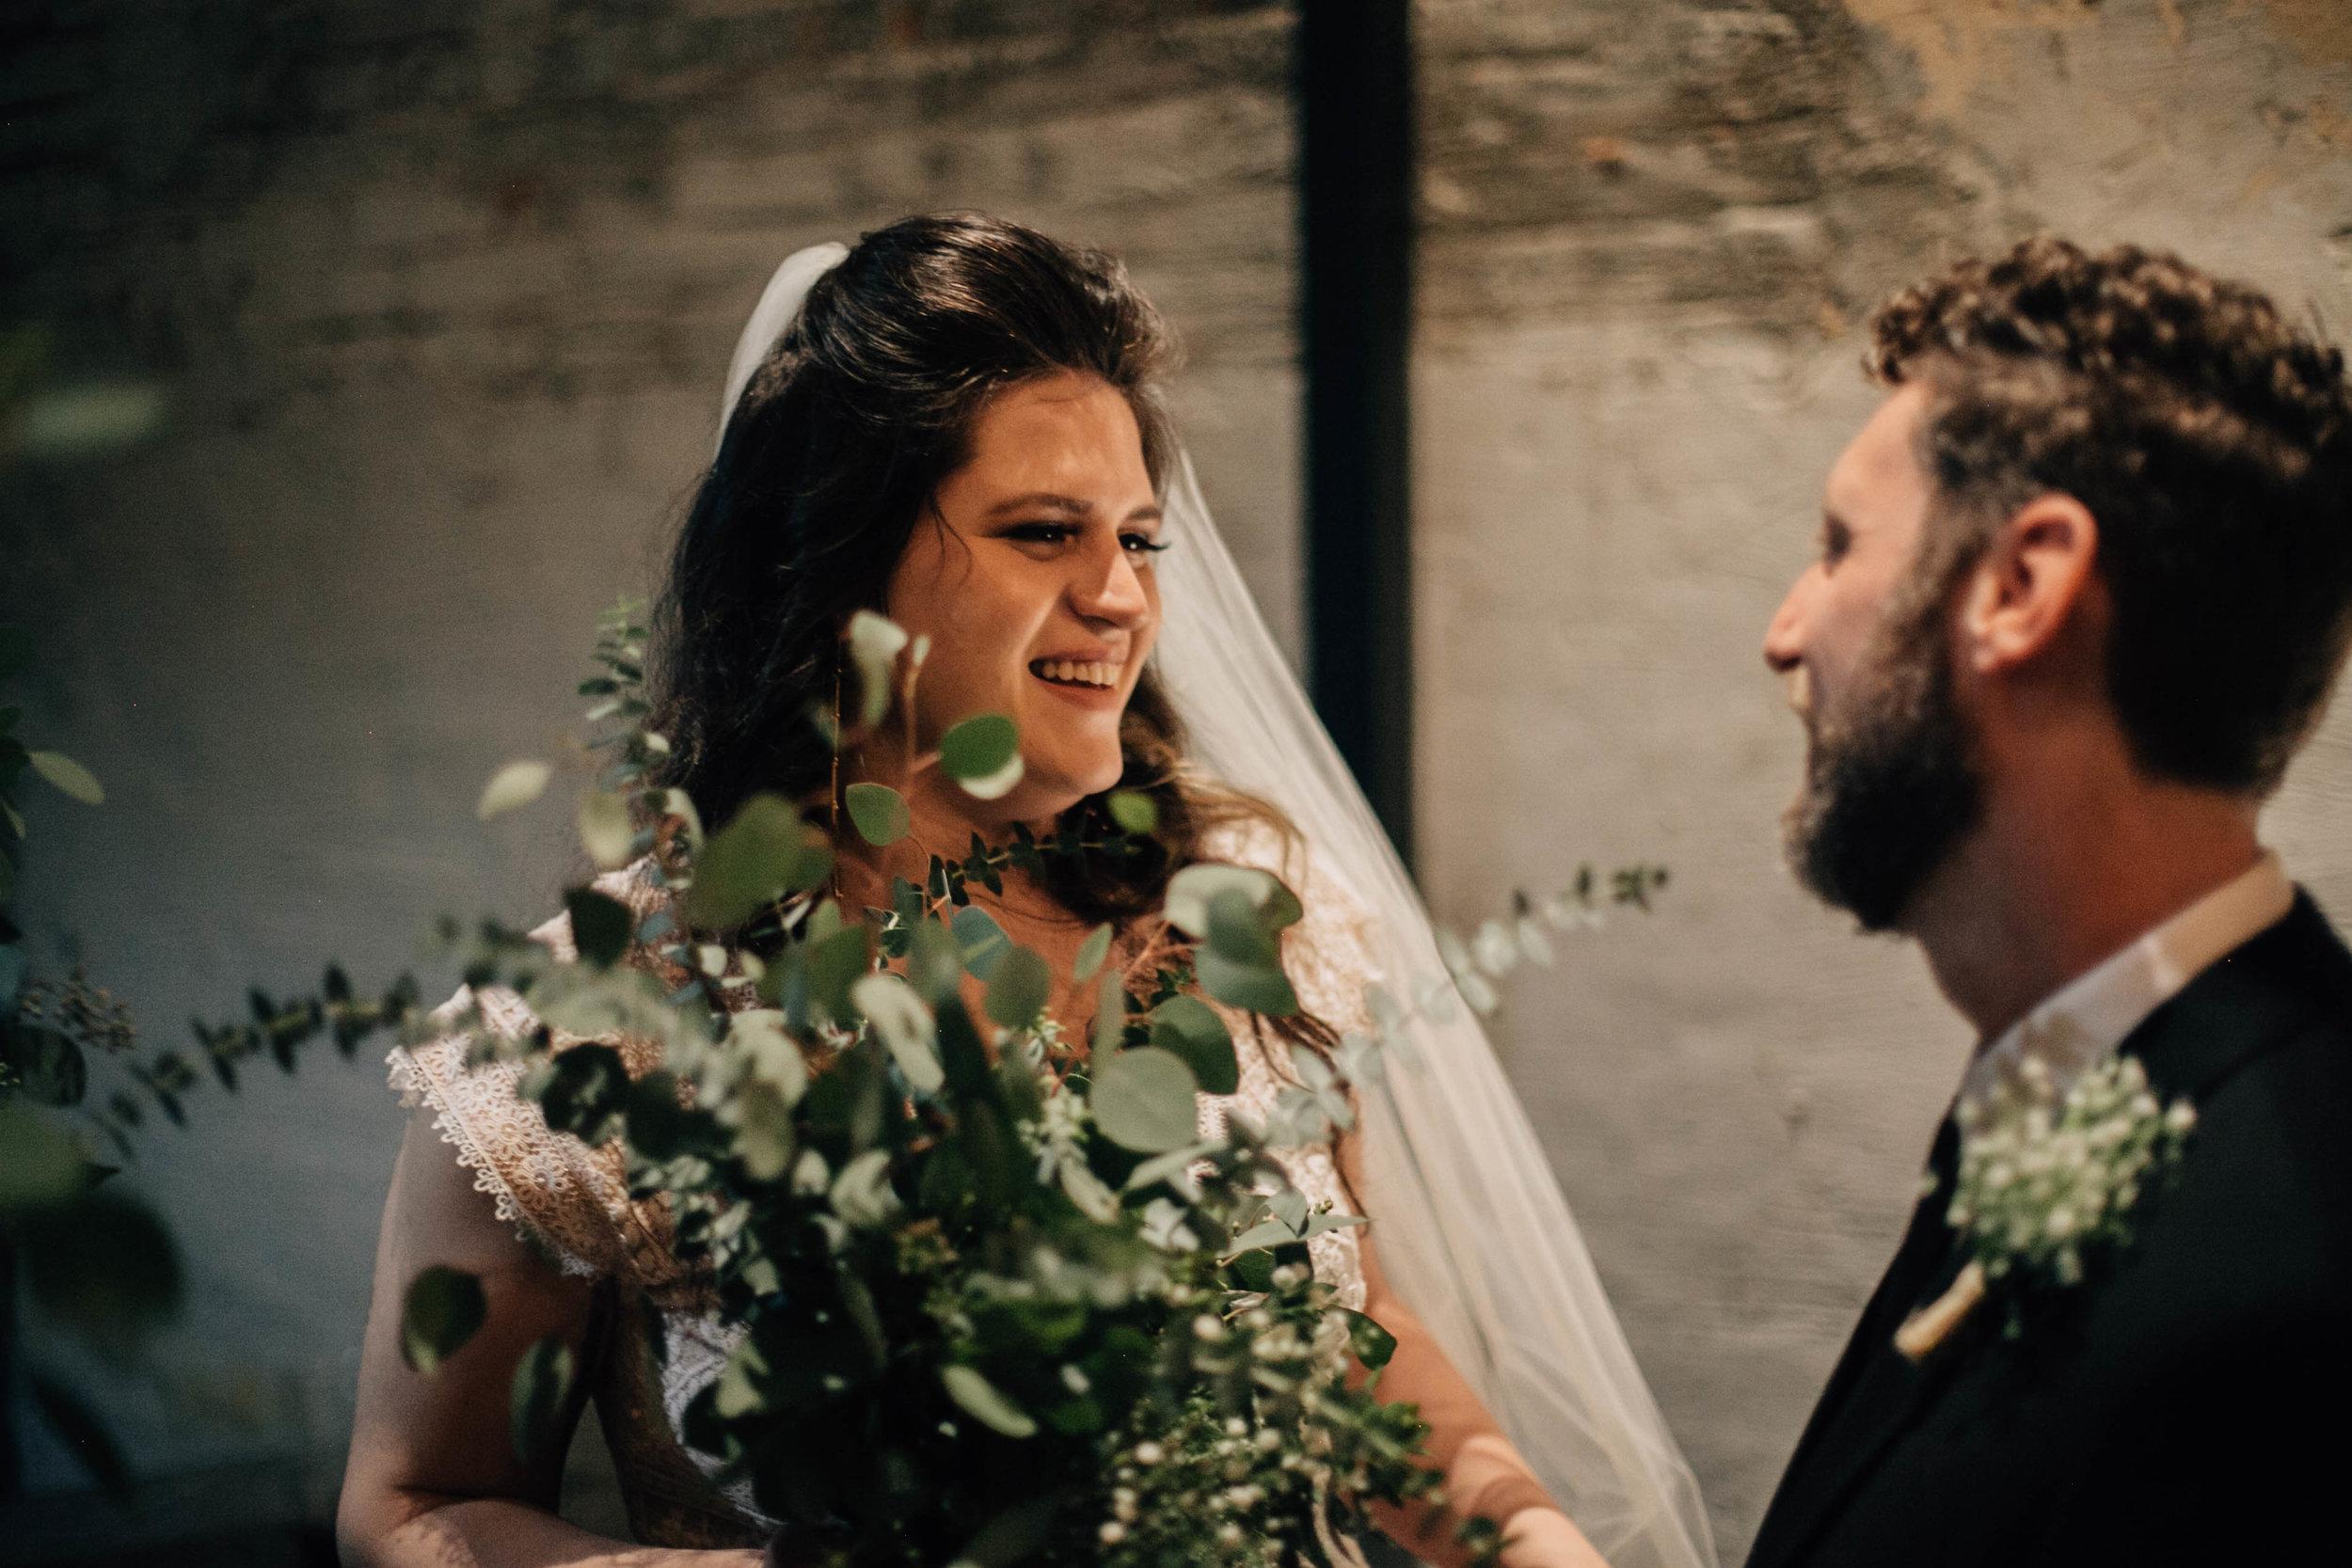 Hannah + Albert - Married November 4h, 2017 // Second Shooter